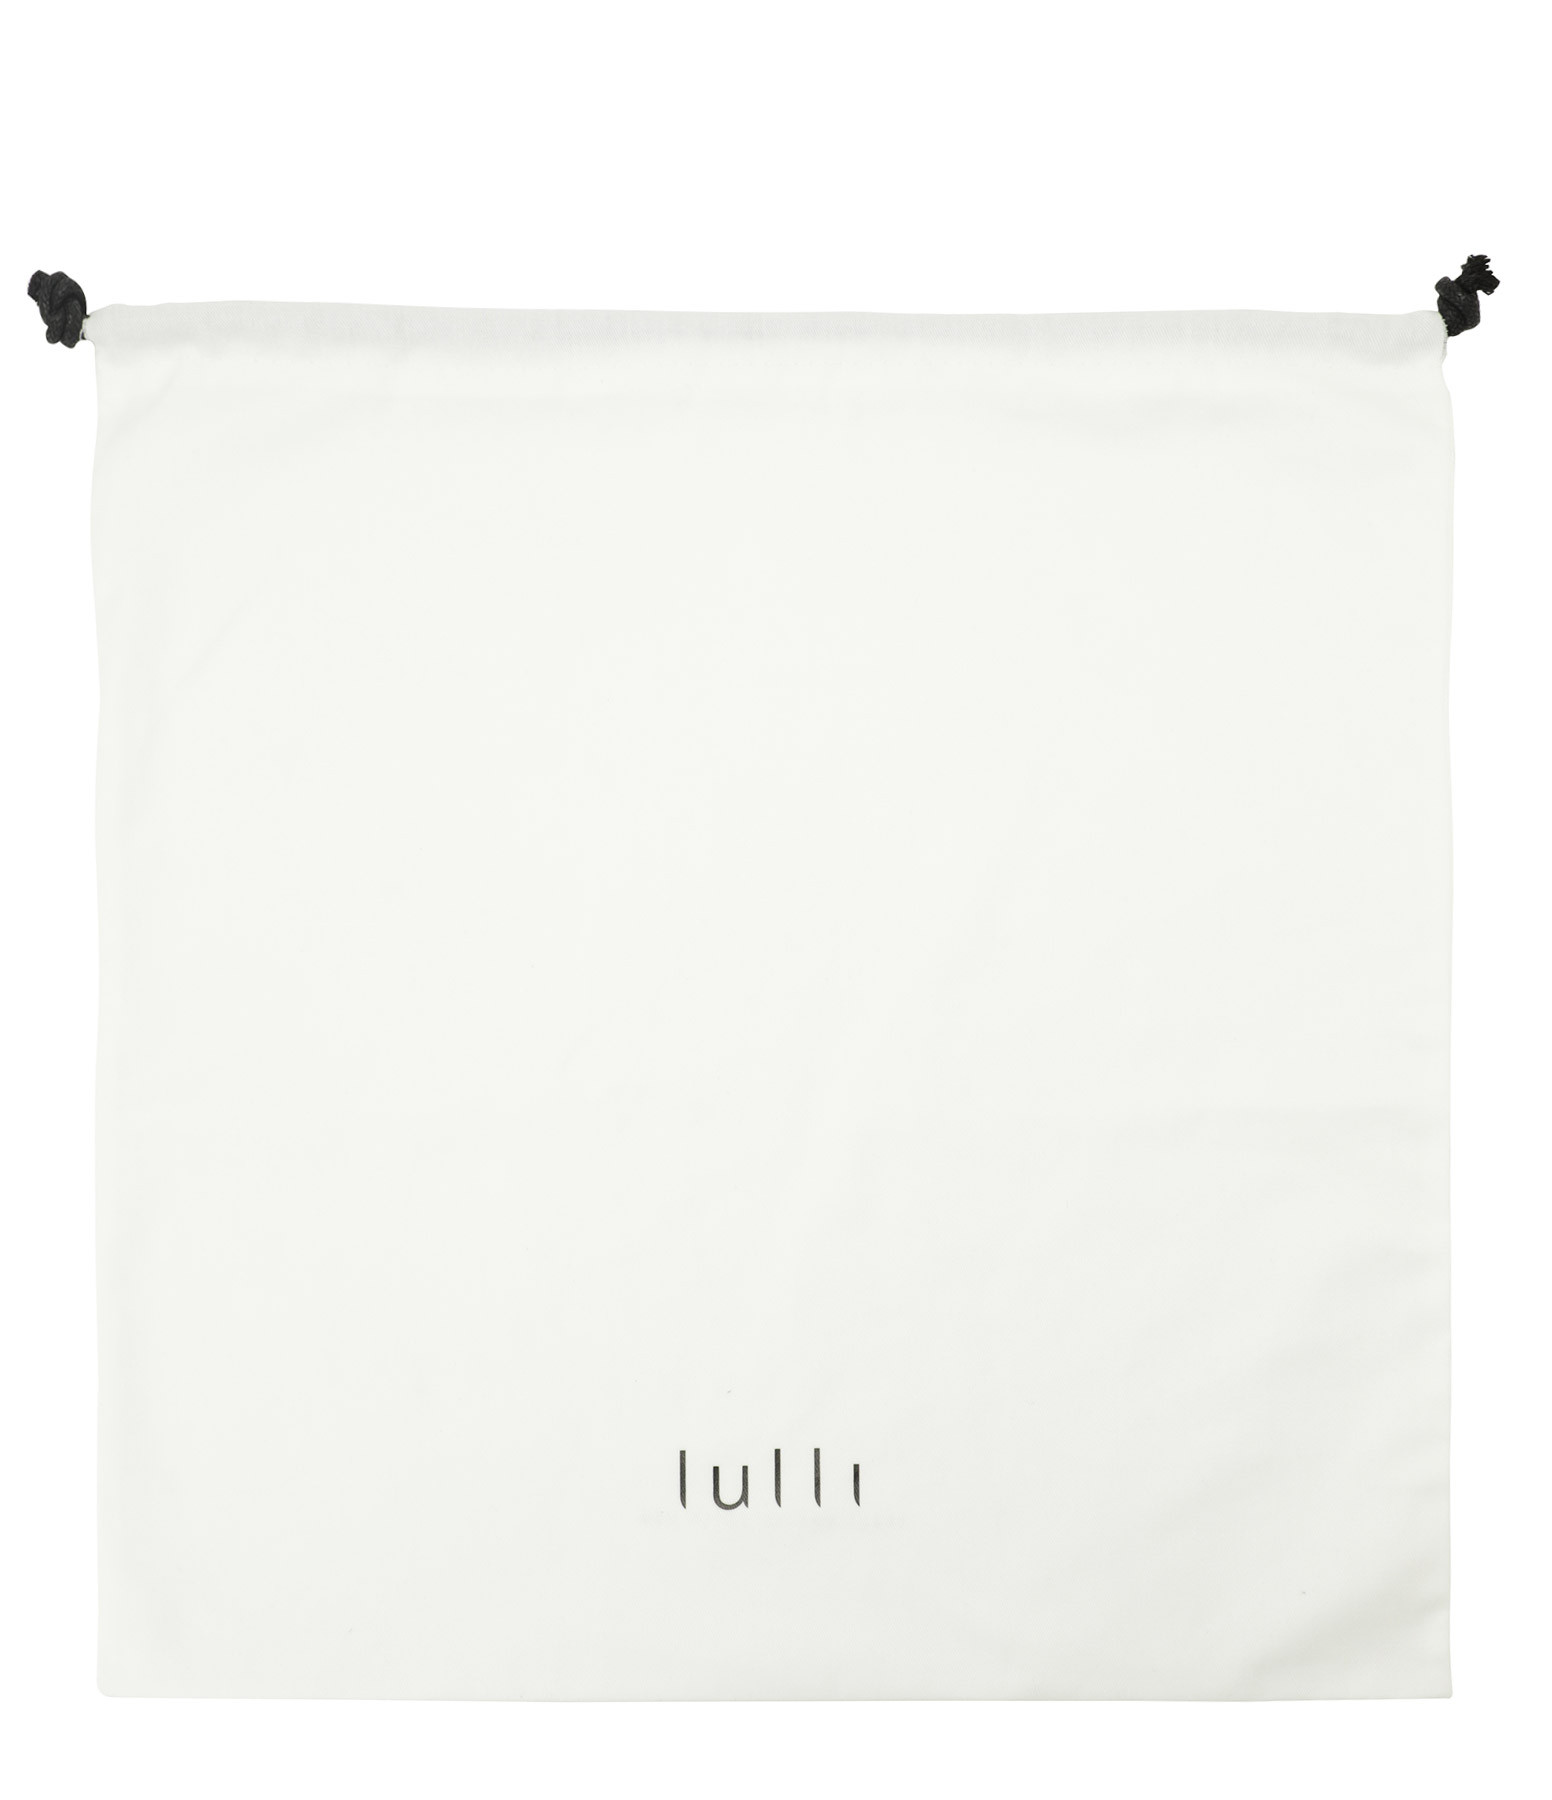 LULLI - Pochette Coton 60x50cm Imprimé Lulli